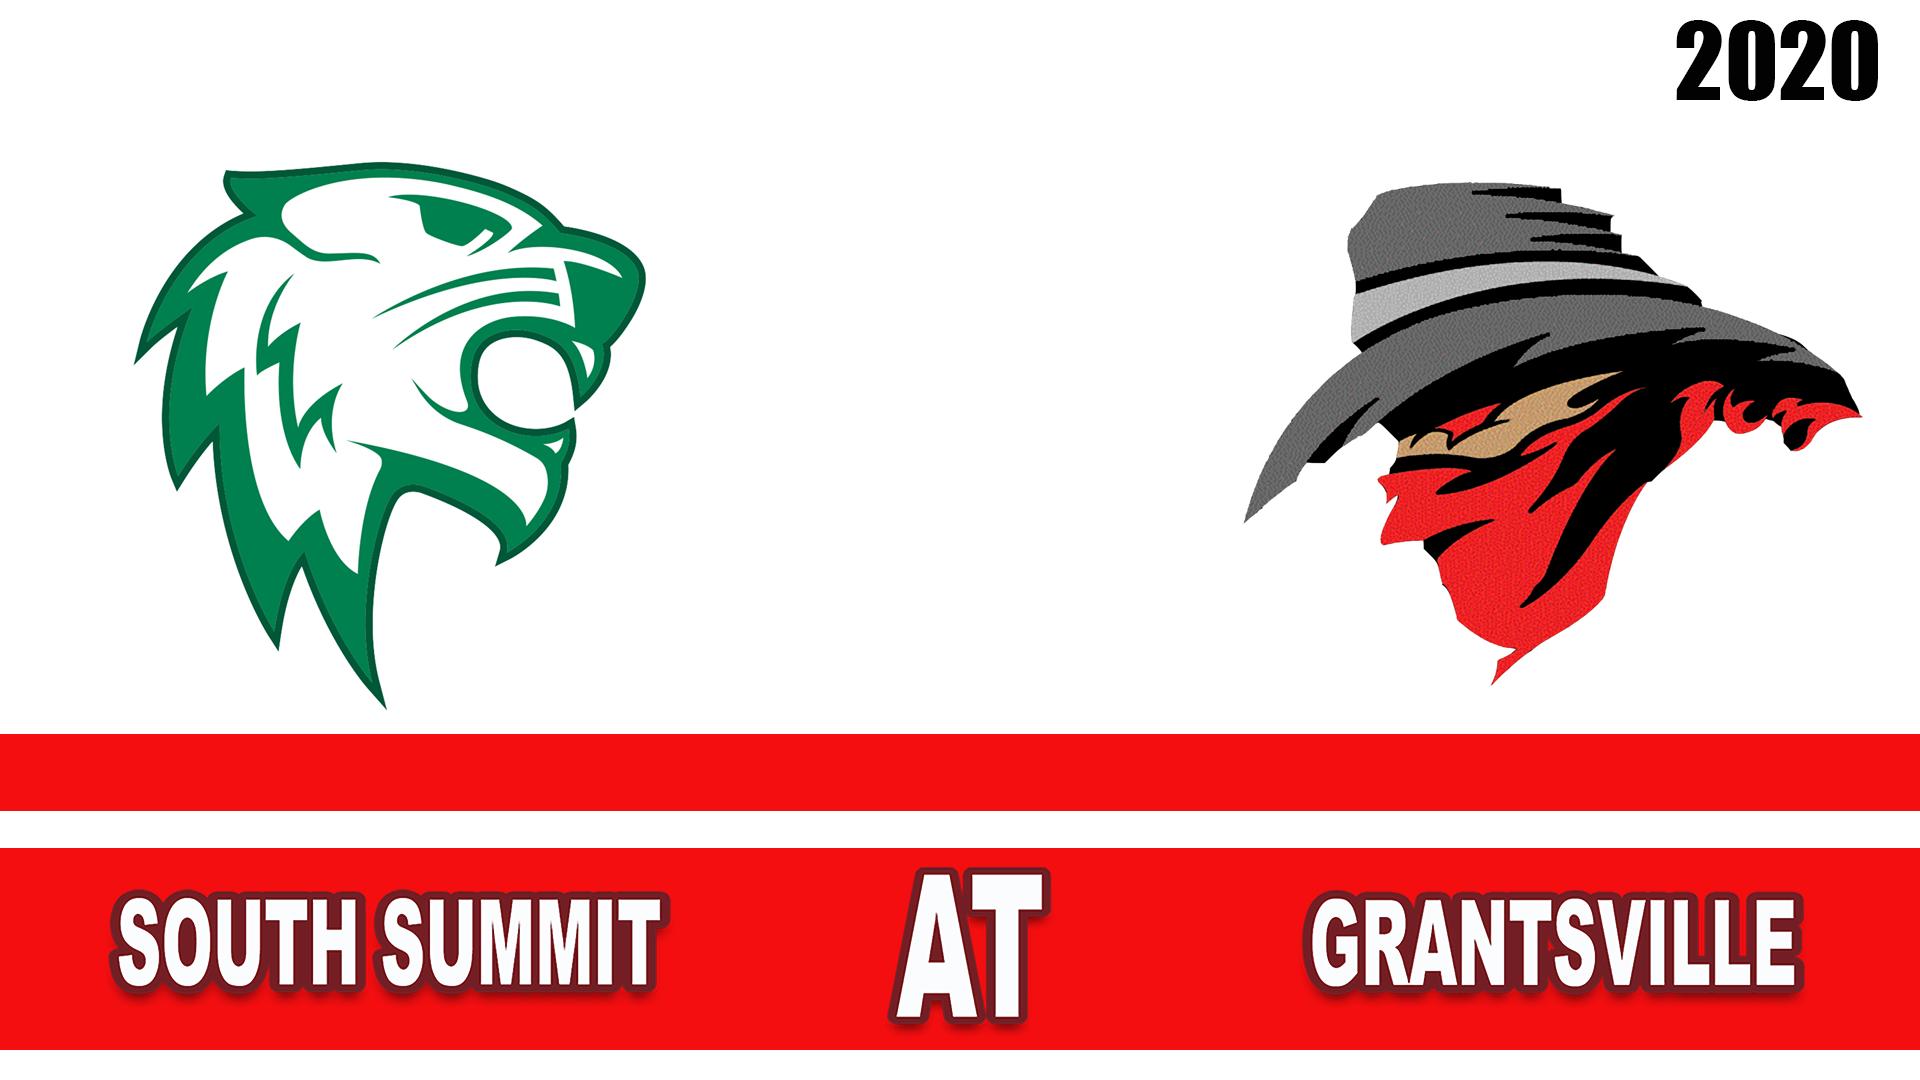 South Summit at Grantsville